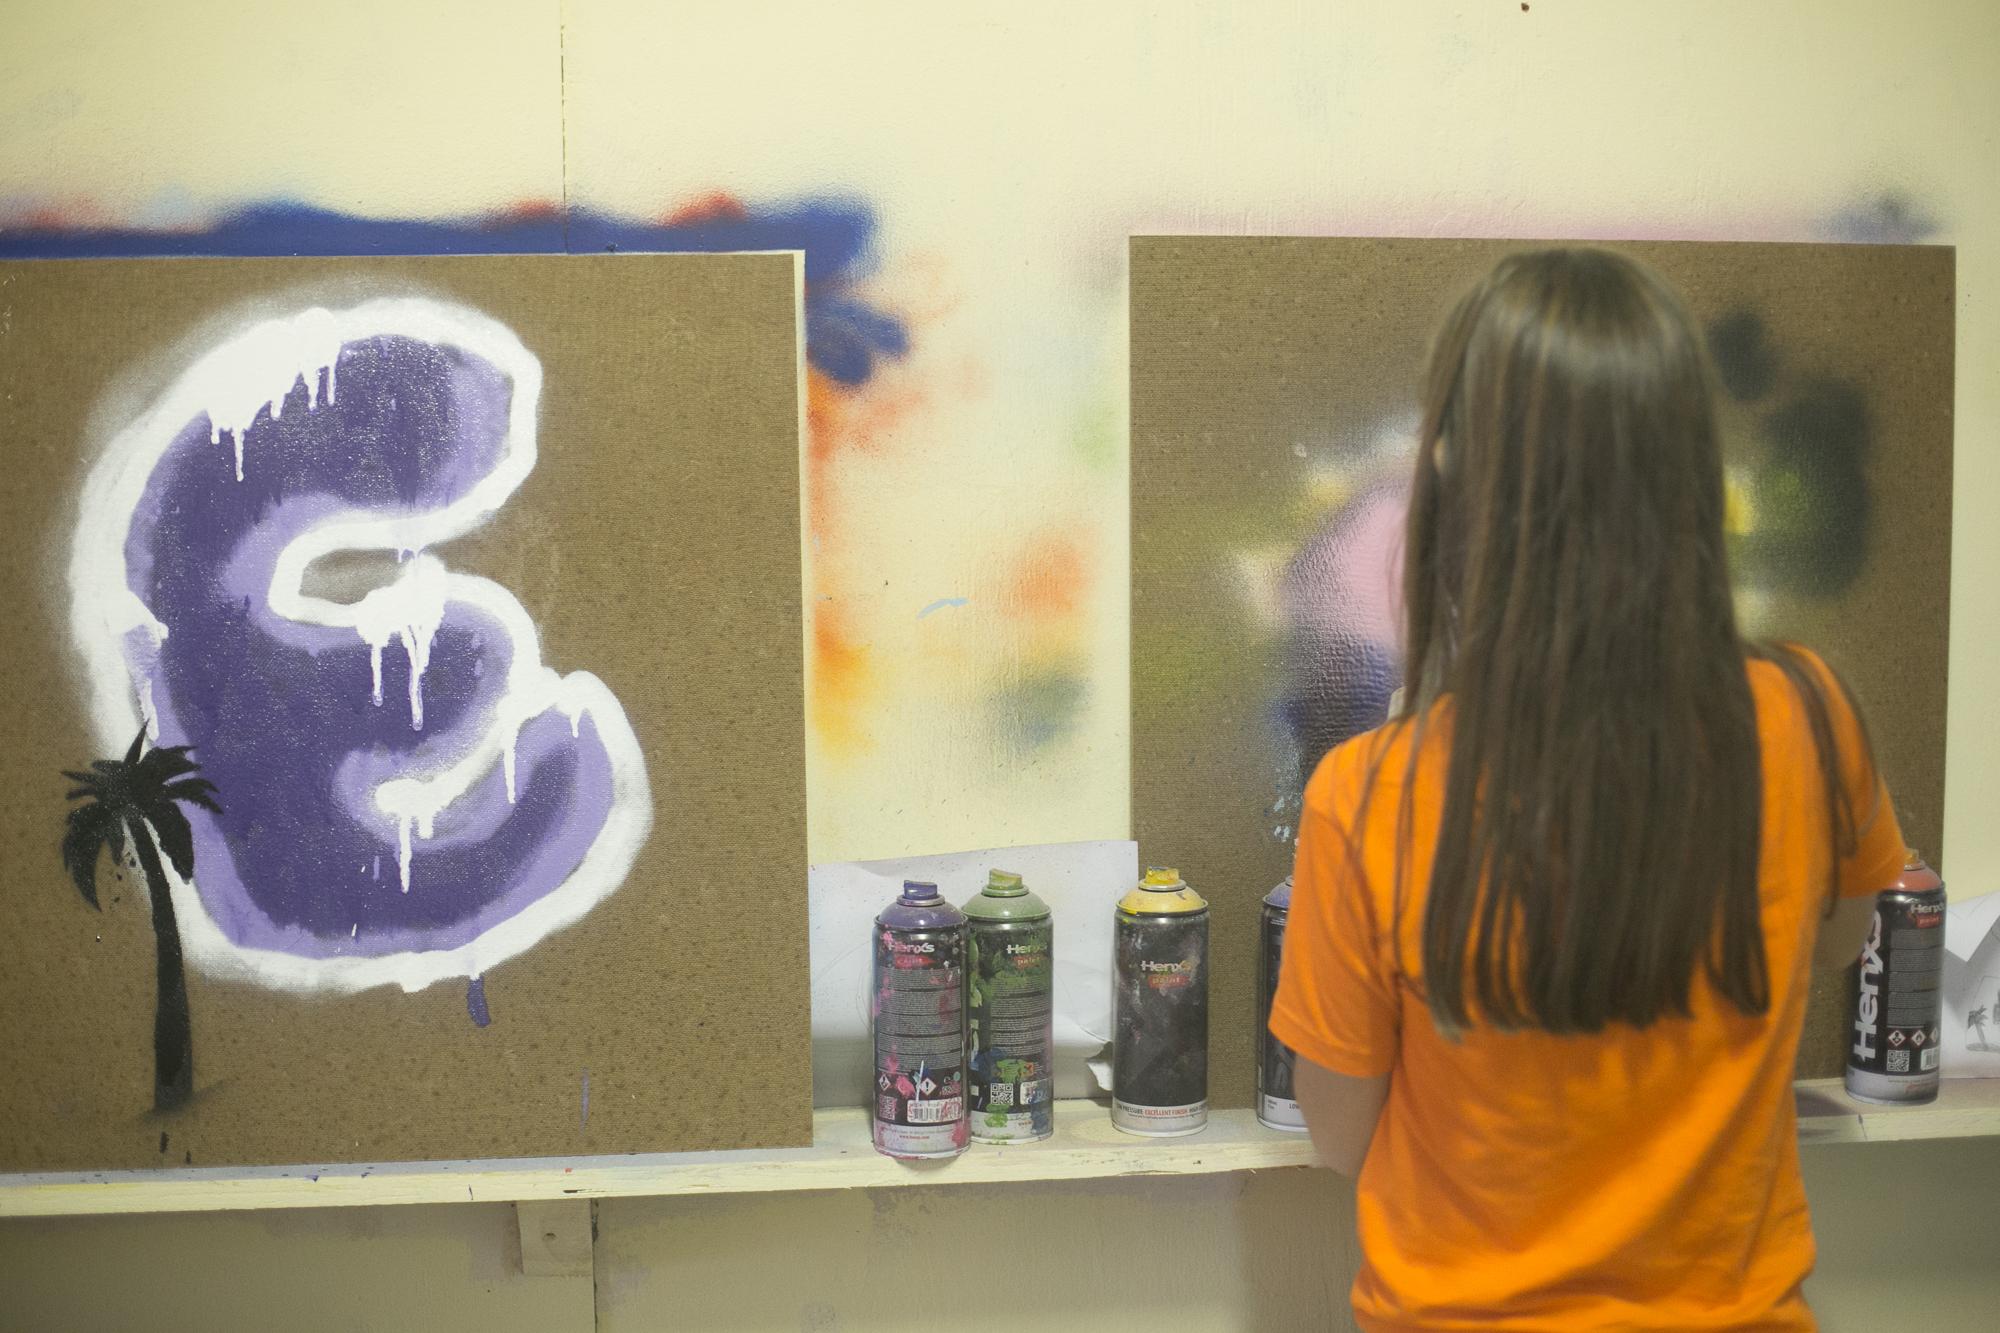 Graffitiworkshop skatepark sweatshop Kinderfeestje .jpg